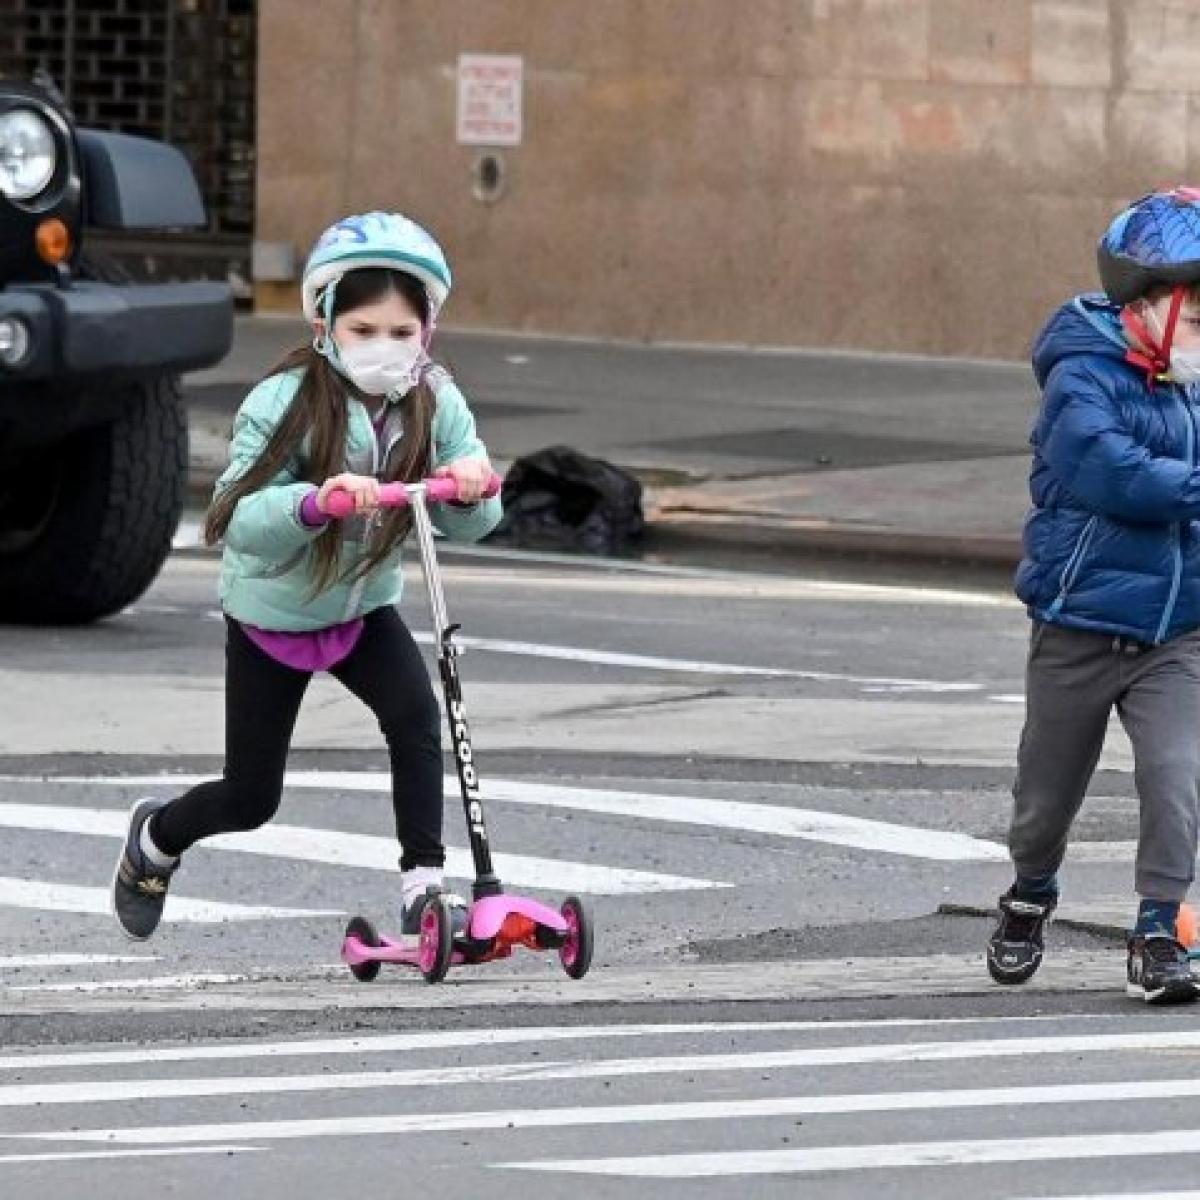 Pandemic: Through the eyes of world's children